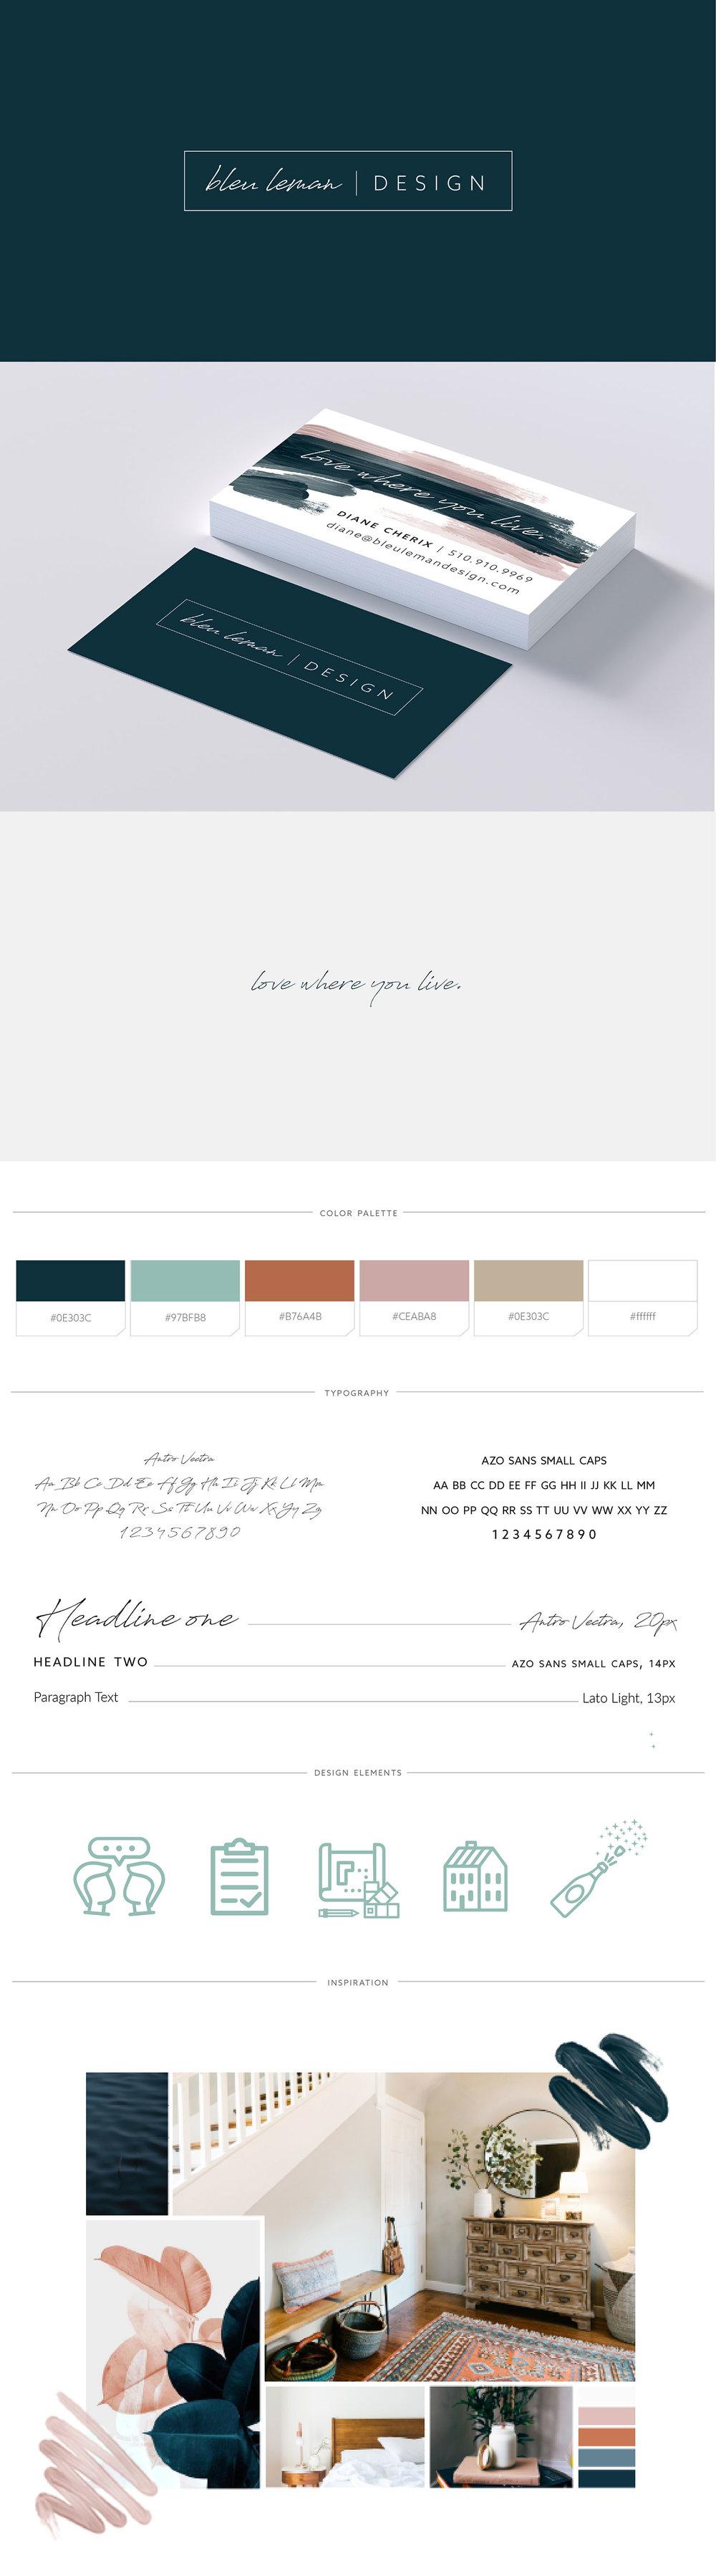 bleu-leman-design-brand-board.jpg